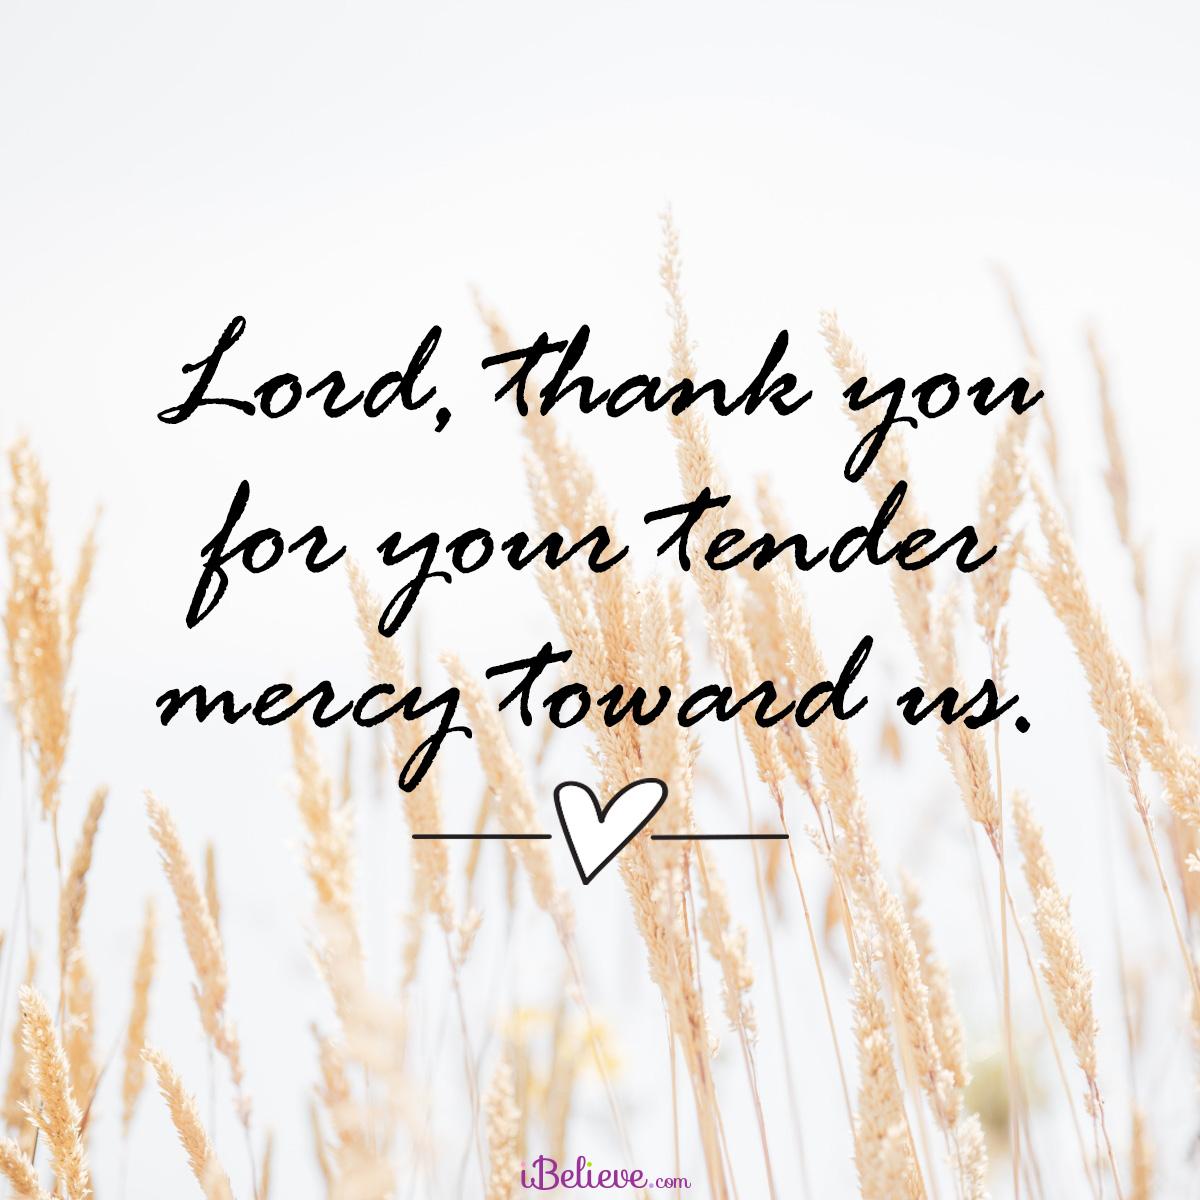 Tender mercy, inspirational image